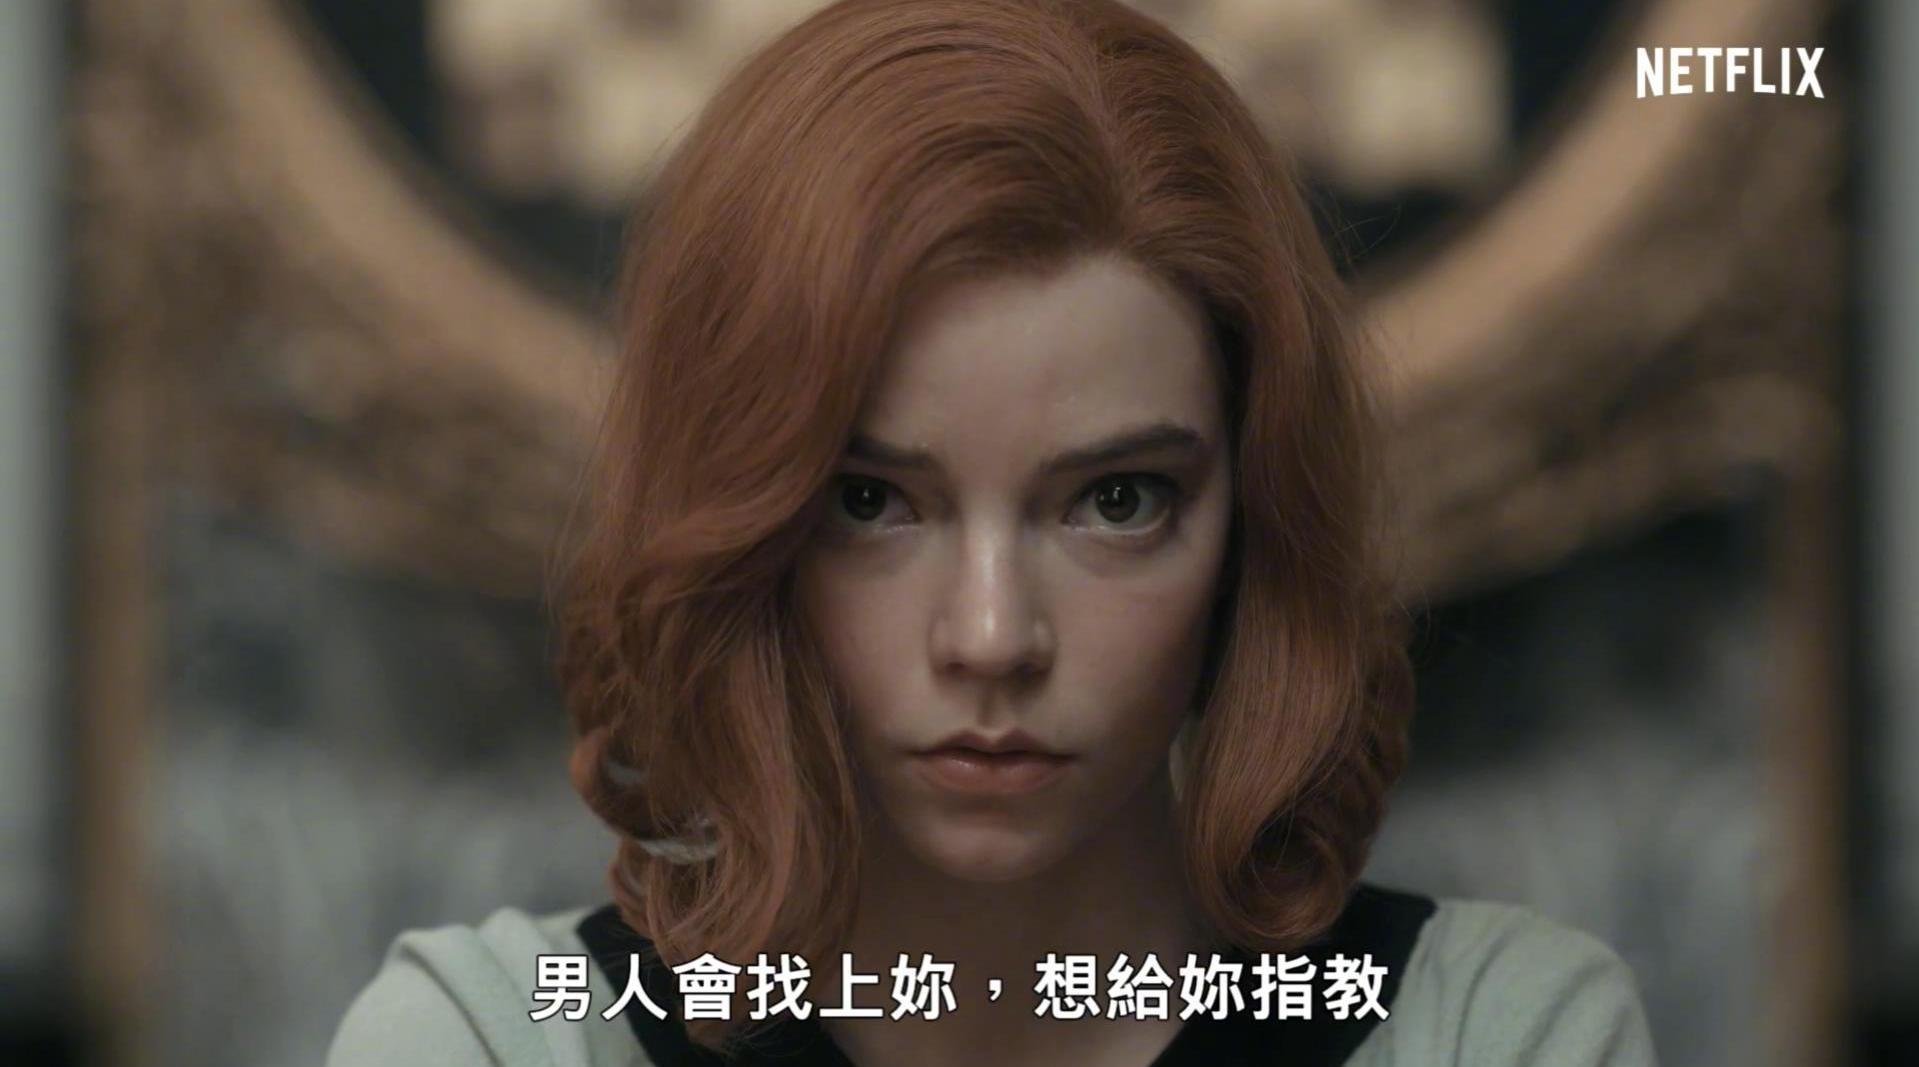 Netflix美剧《女王的棋局》官方中文正式版预告片点评